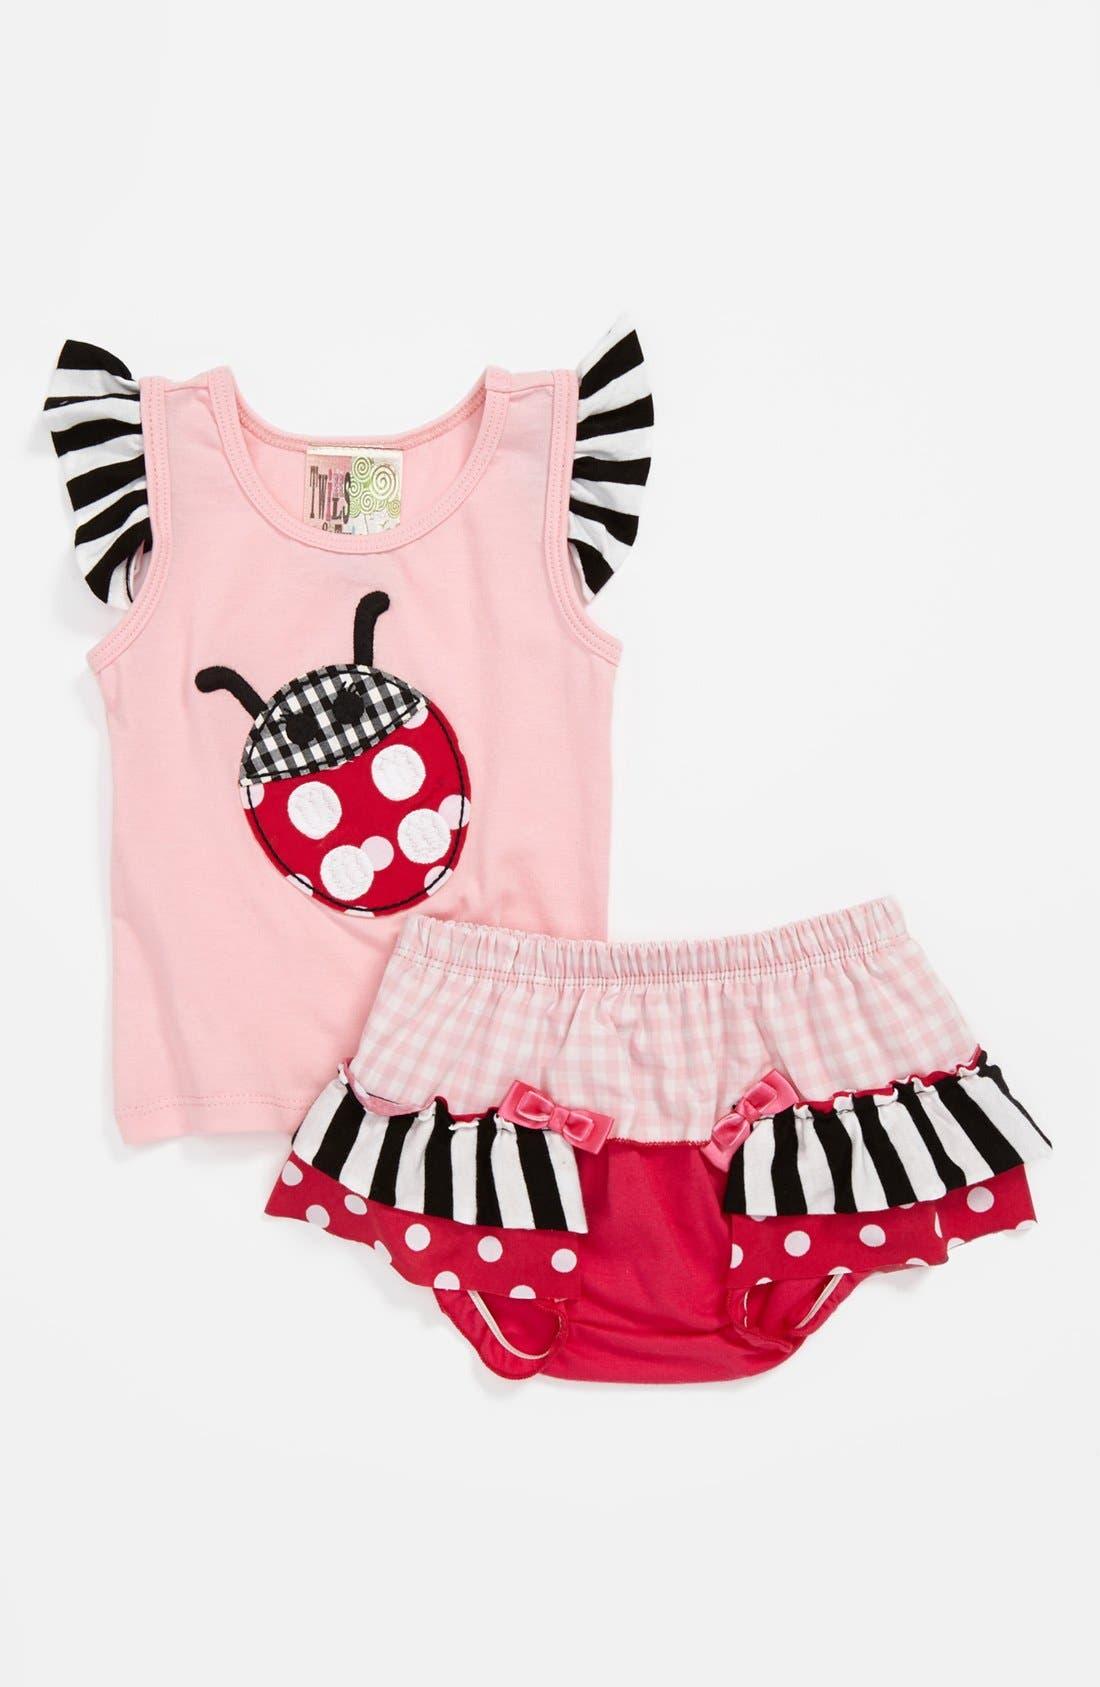 Alternate Image 1 Selected - Twirls & Twigs 'Ladybug' Top & Bloomers (Baby Girls)